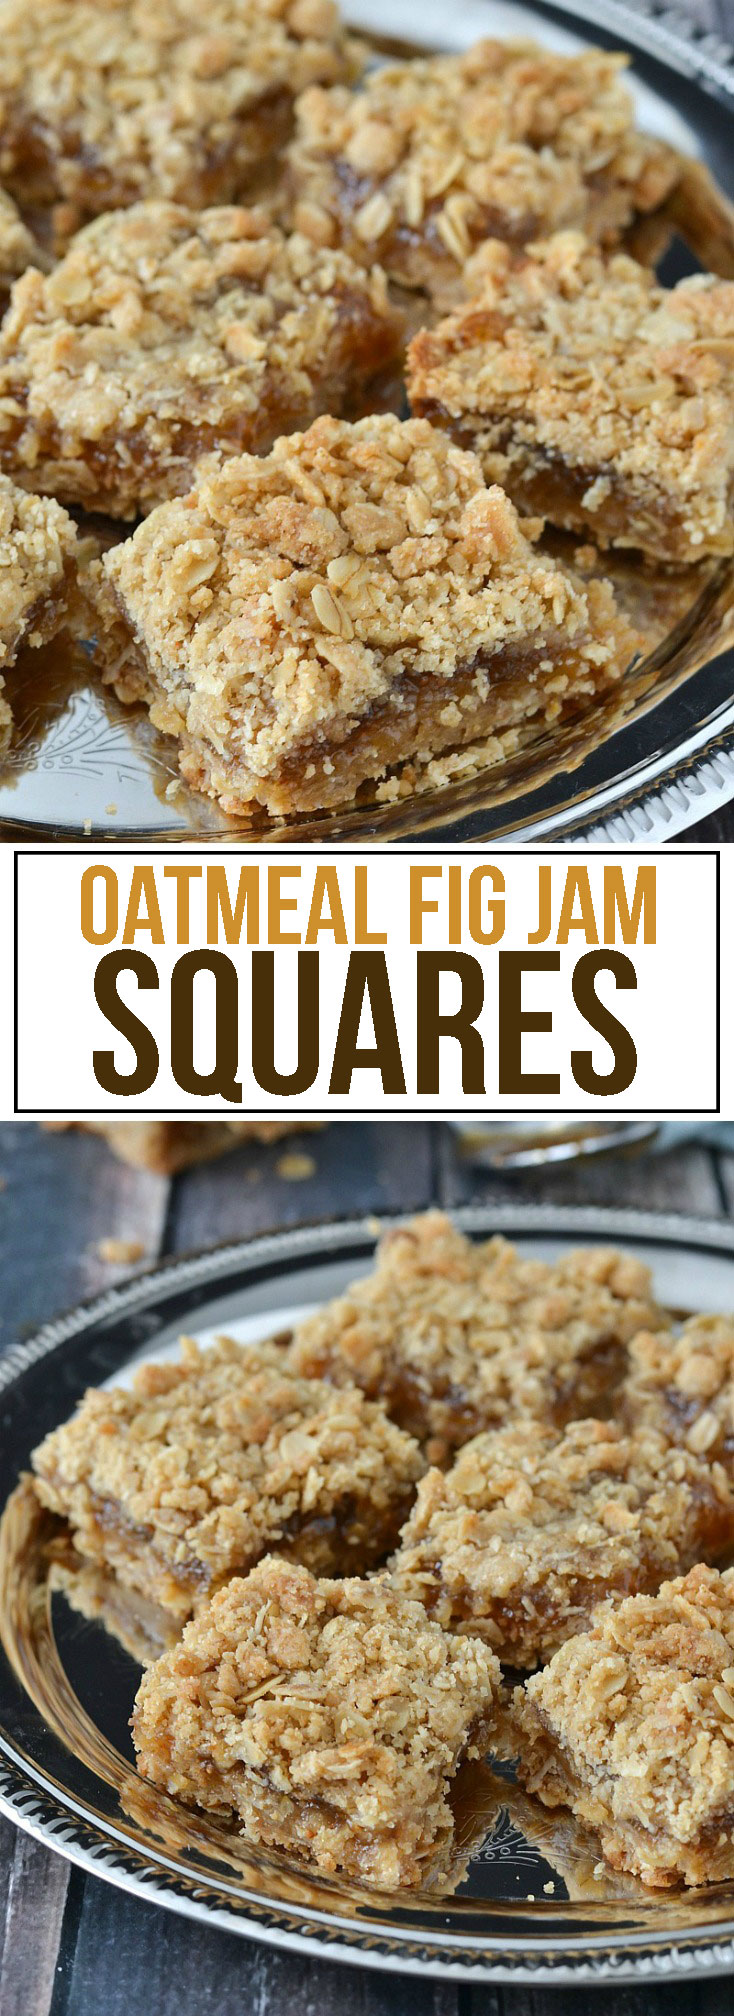 Oatmeal Fig Jam Squares